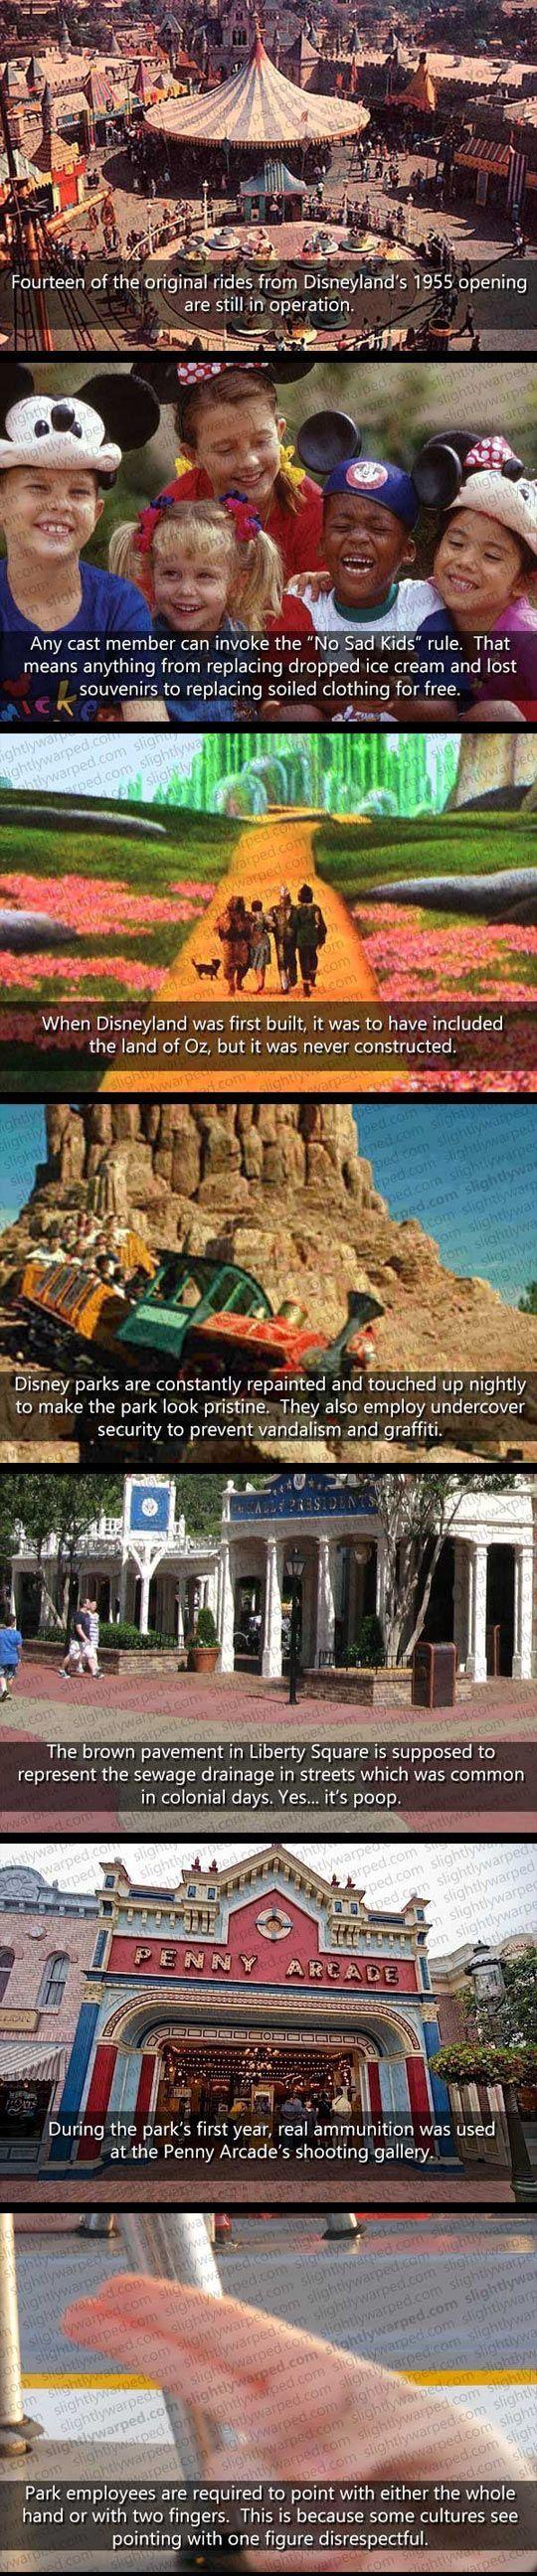 I love Disney fun facts